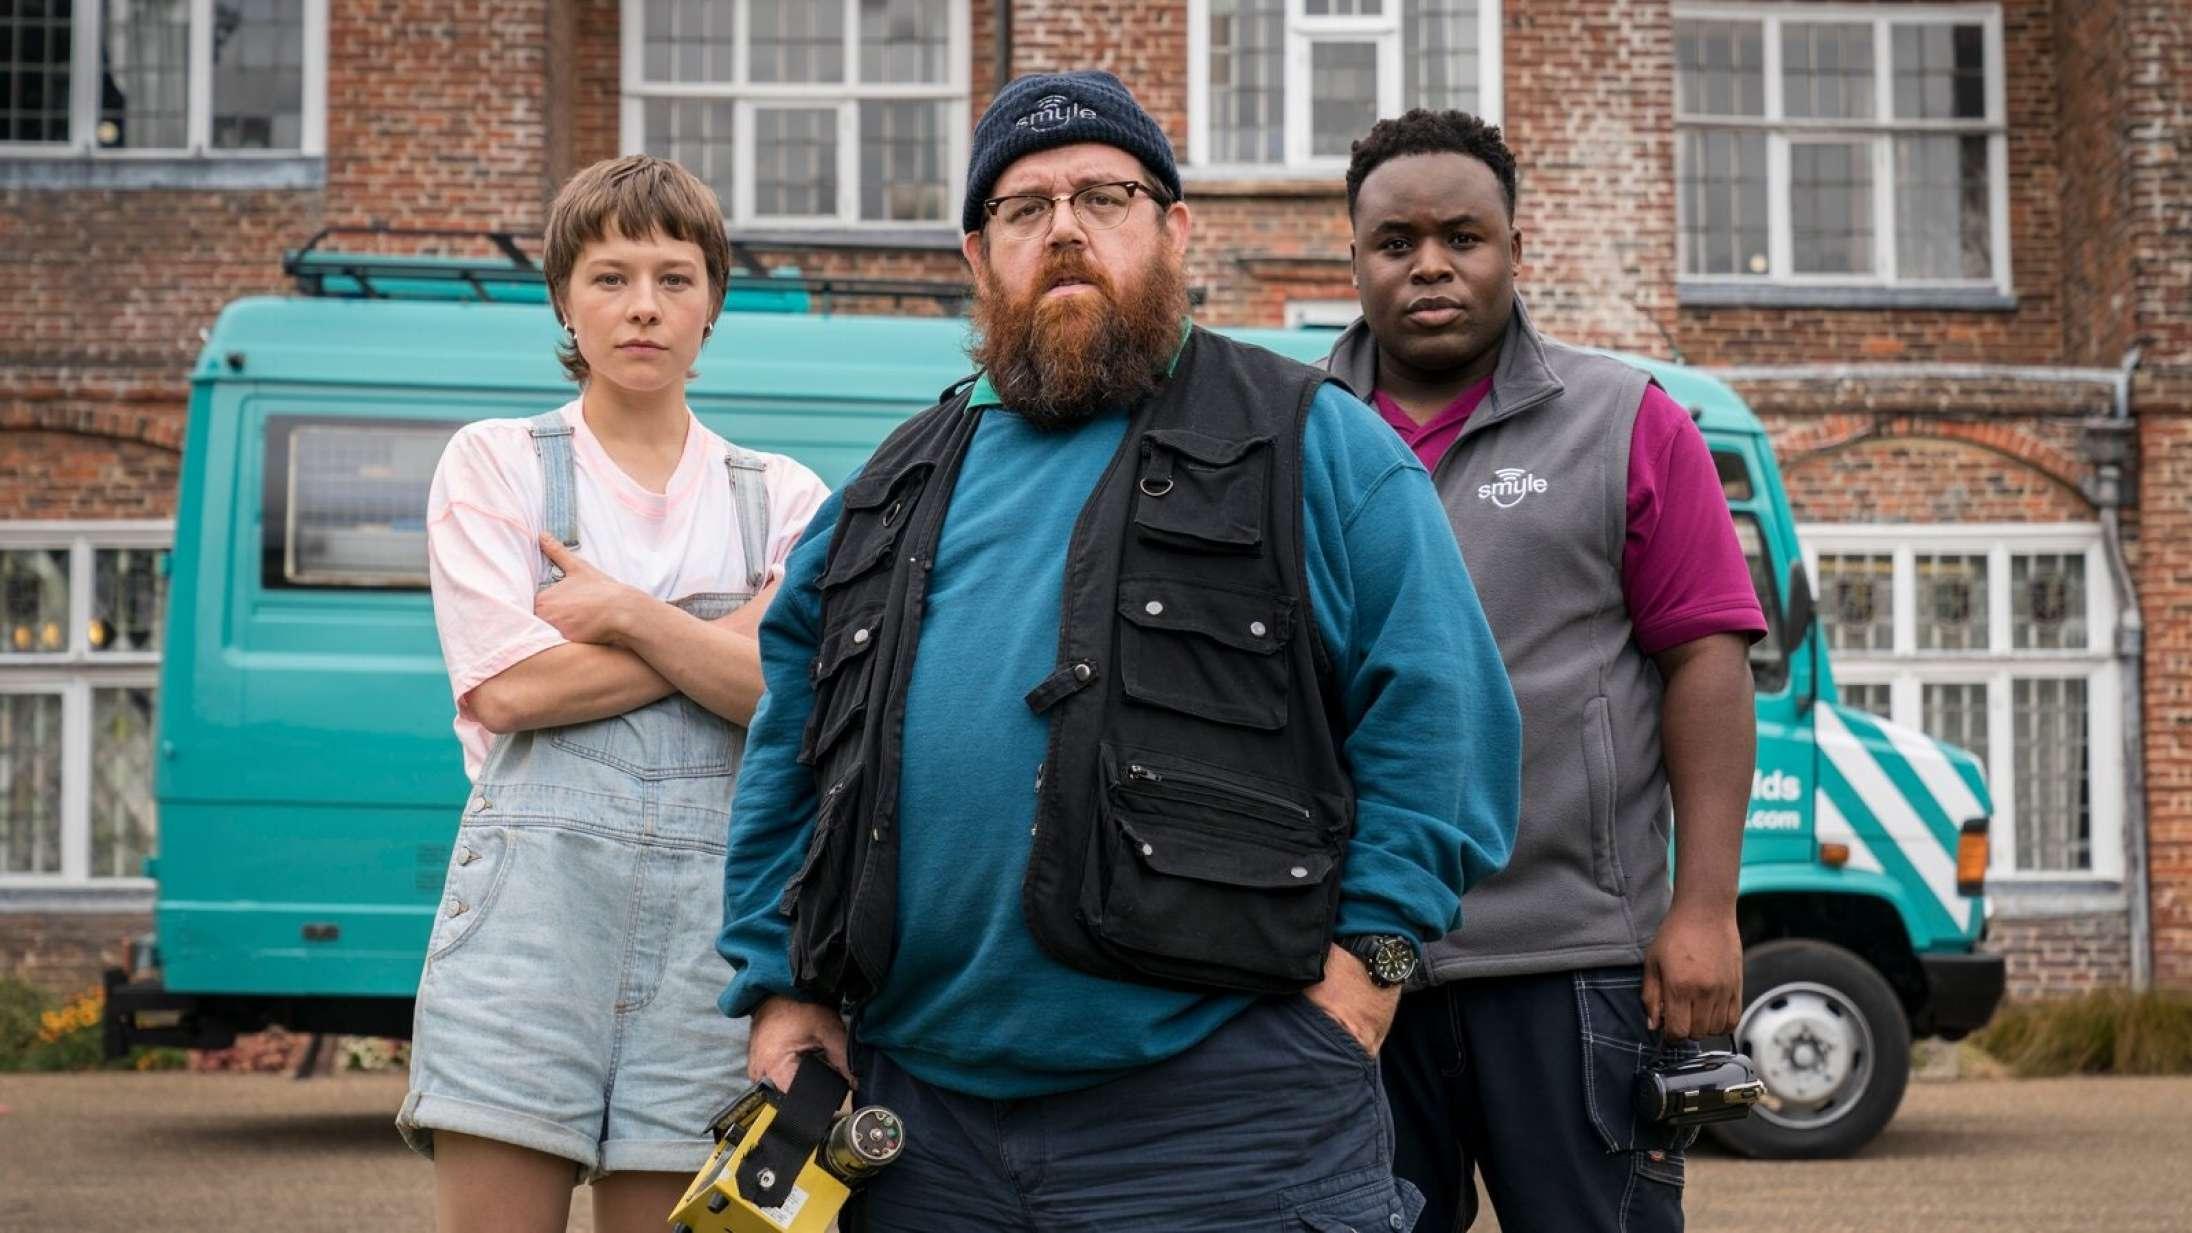 'Truth Seekers': Spøgelsesserie med Simon Pegg og Nick Frost bliver bedre og bedre undervejs